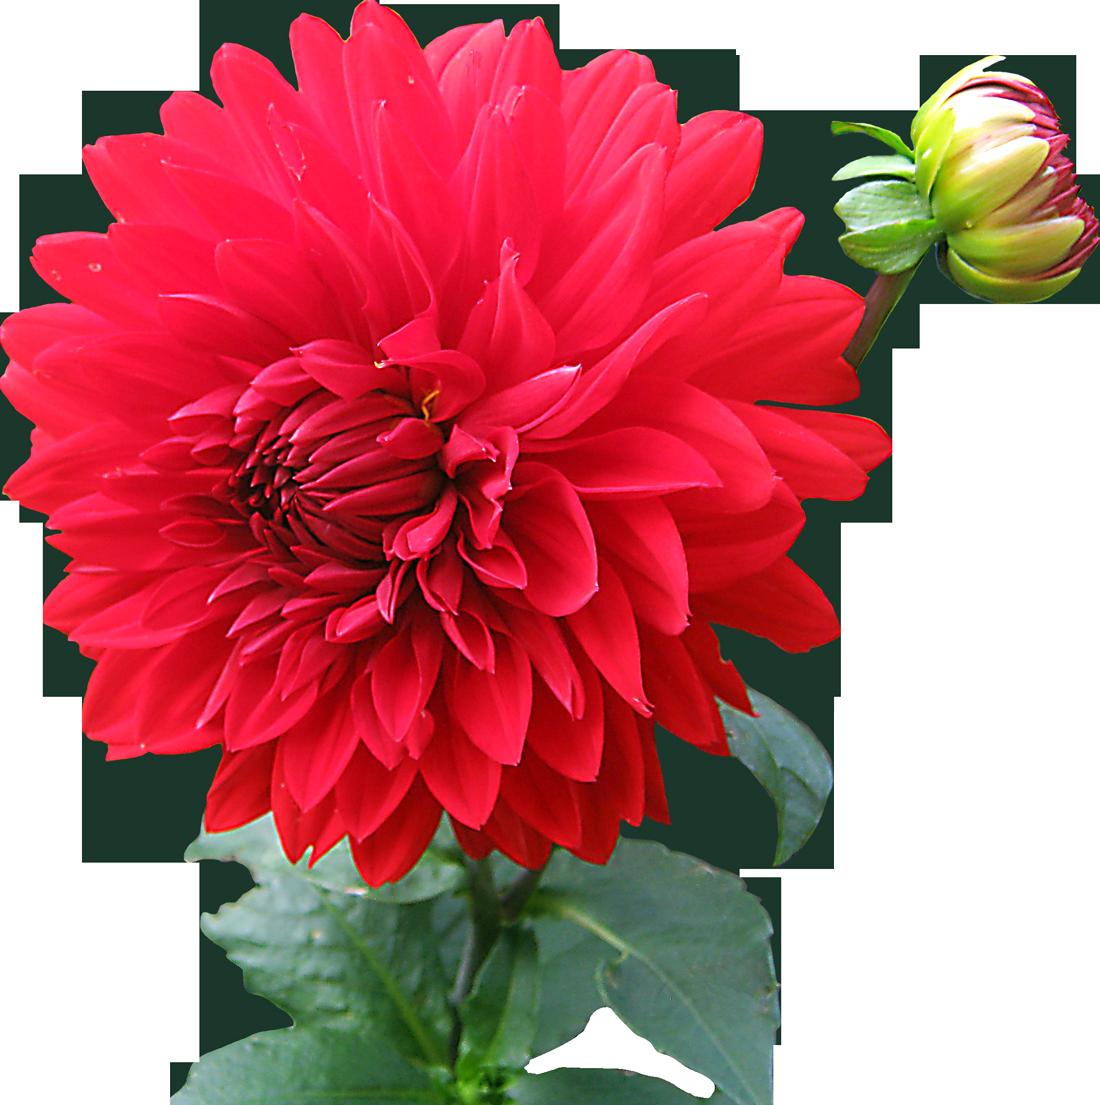 Dahlia flower png image purepng free transparent cc0 png image dahlia flower png image purepng free transparent cc0 png image library izmirmasajfo